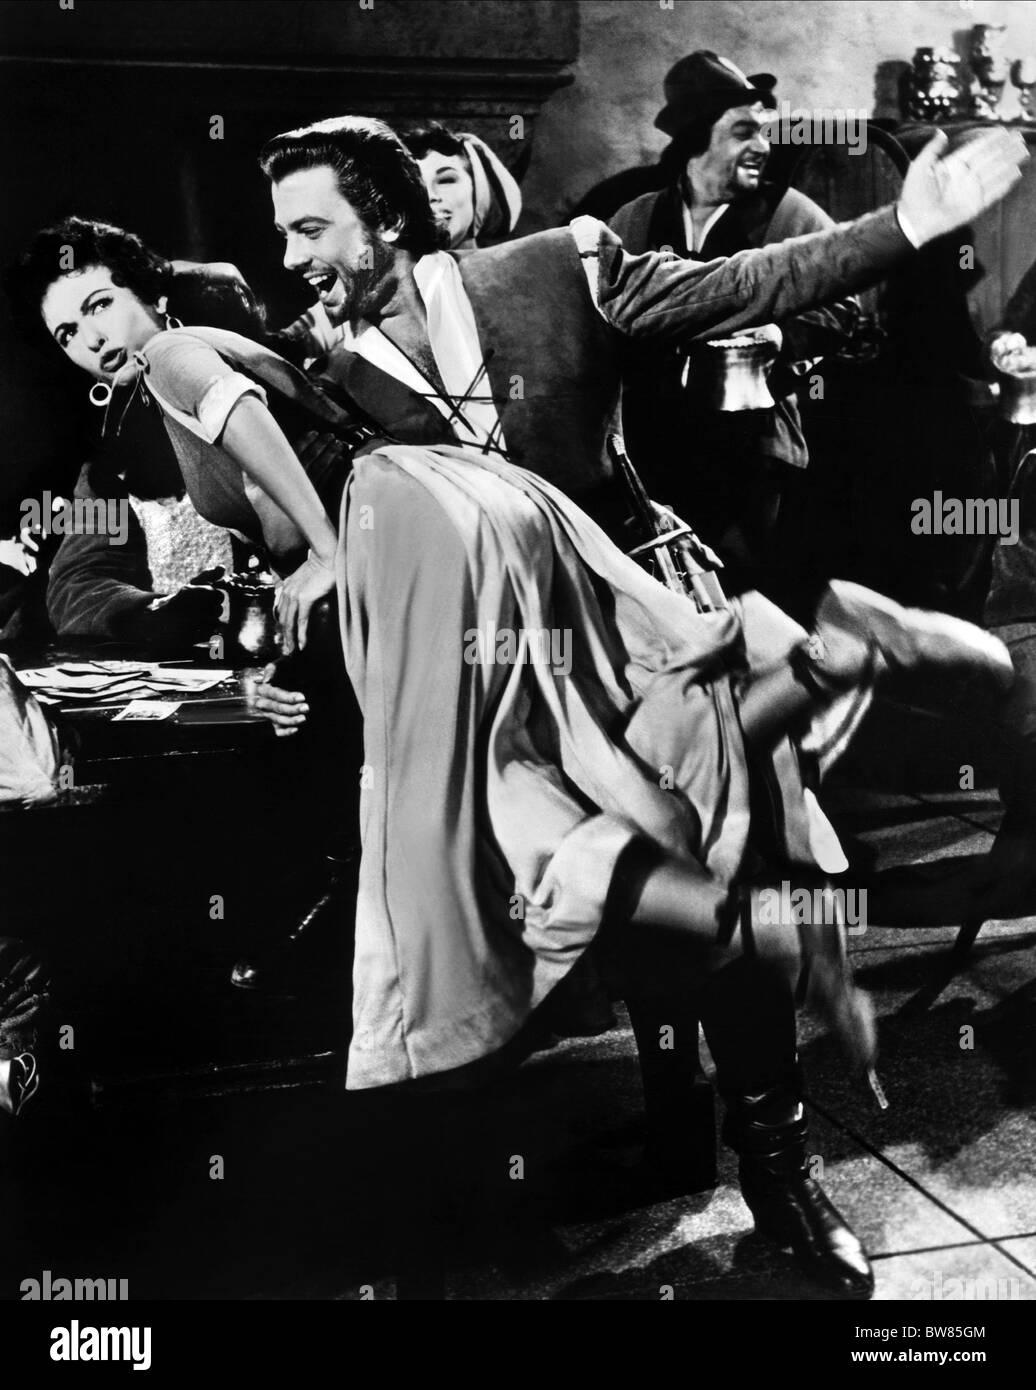 RITA MORENO & ORESTE KIRKOP THE VAGABOND KING (1956) - Stock Image